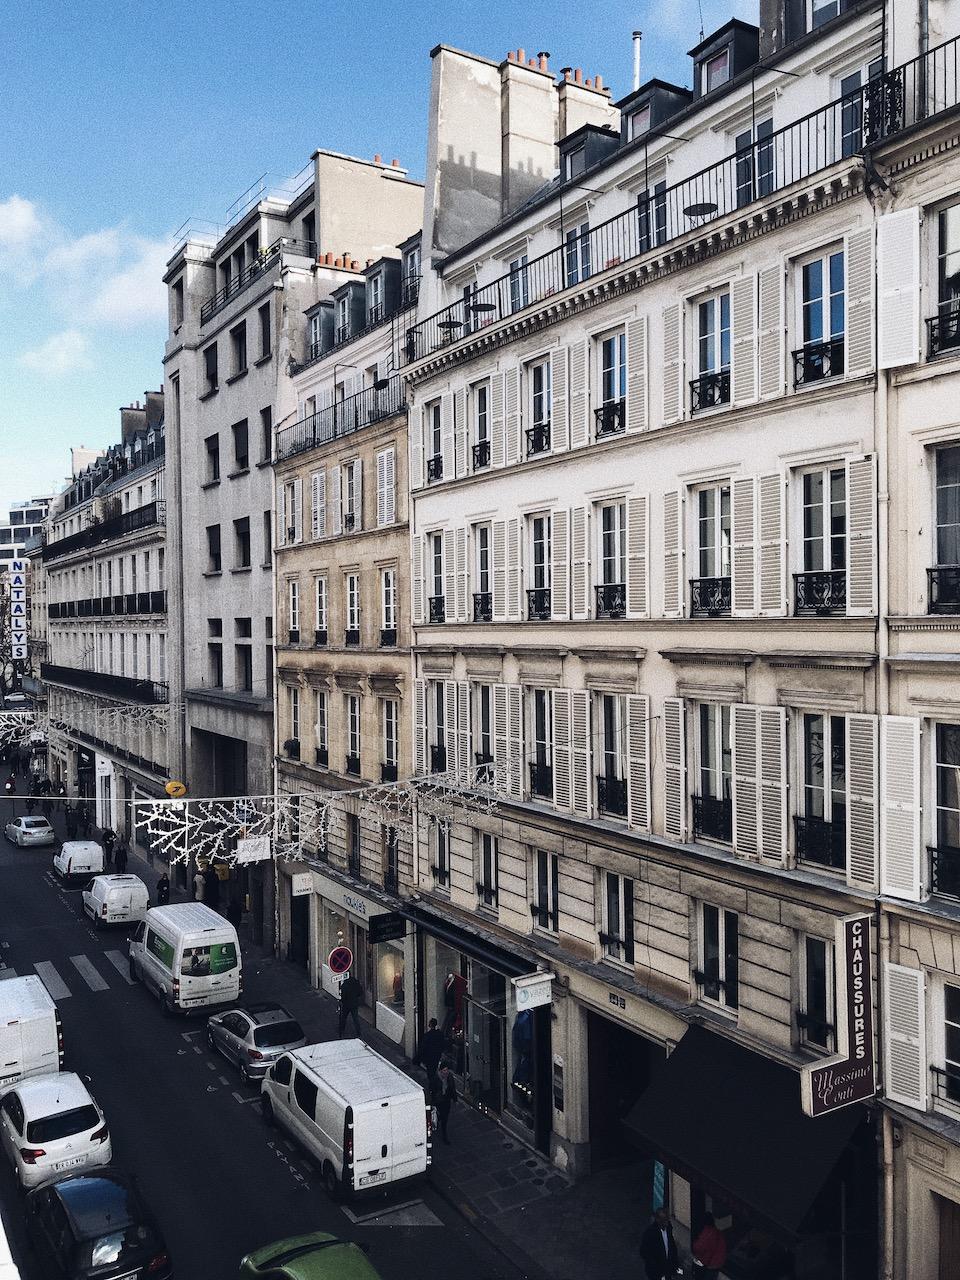 Parisian street view from Hotel Chavanel.